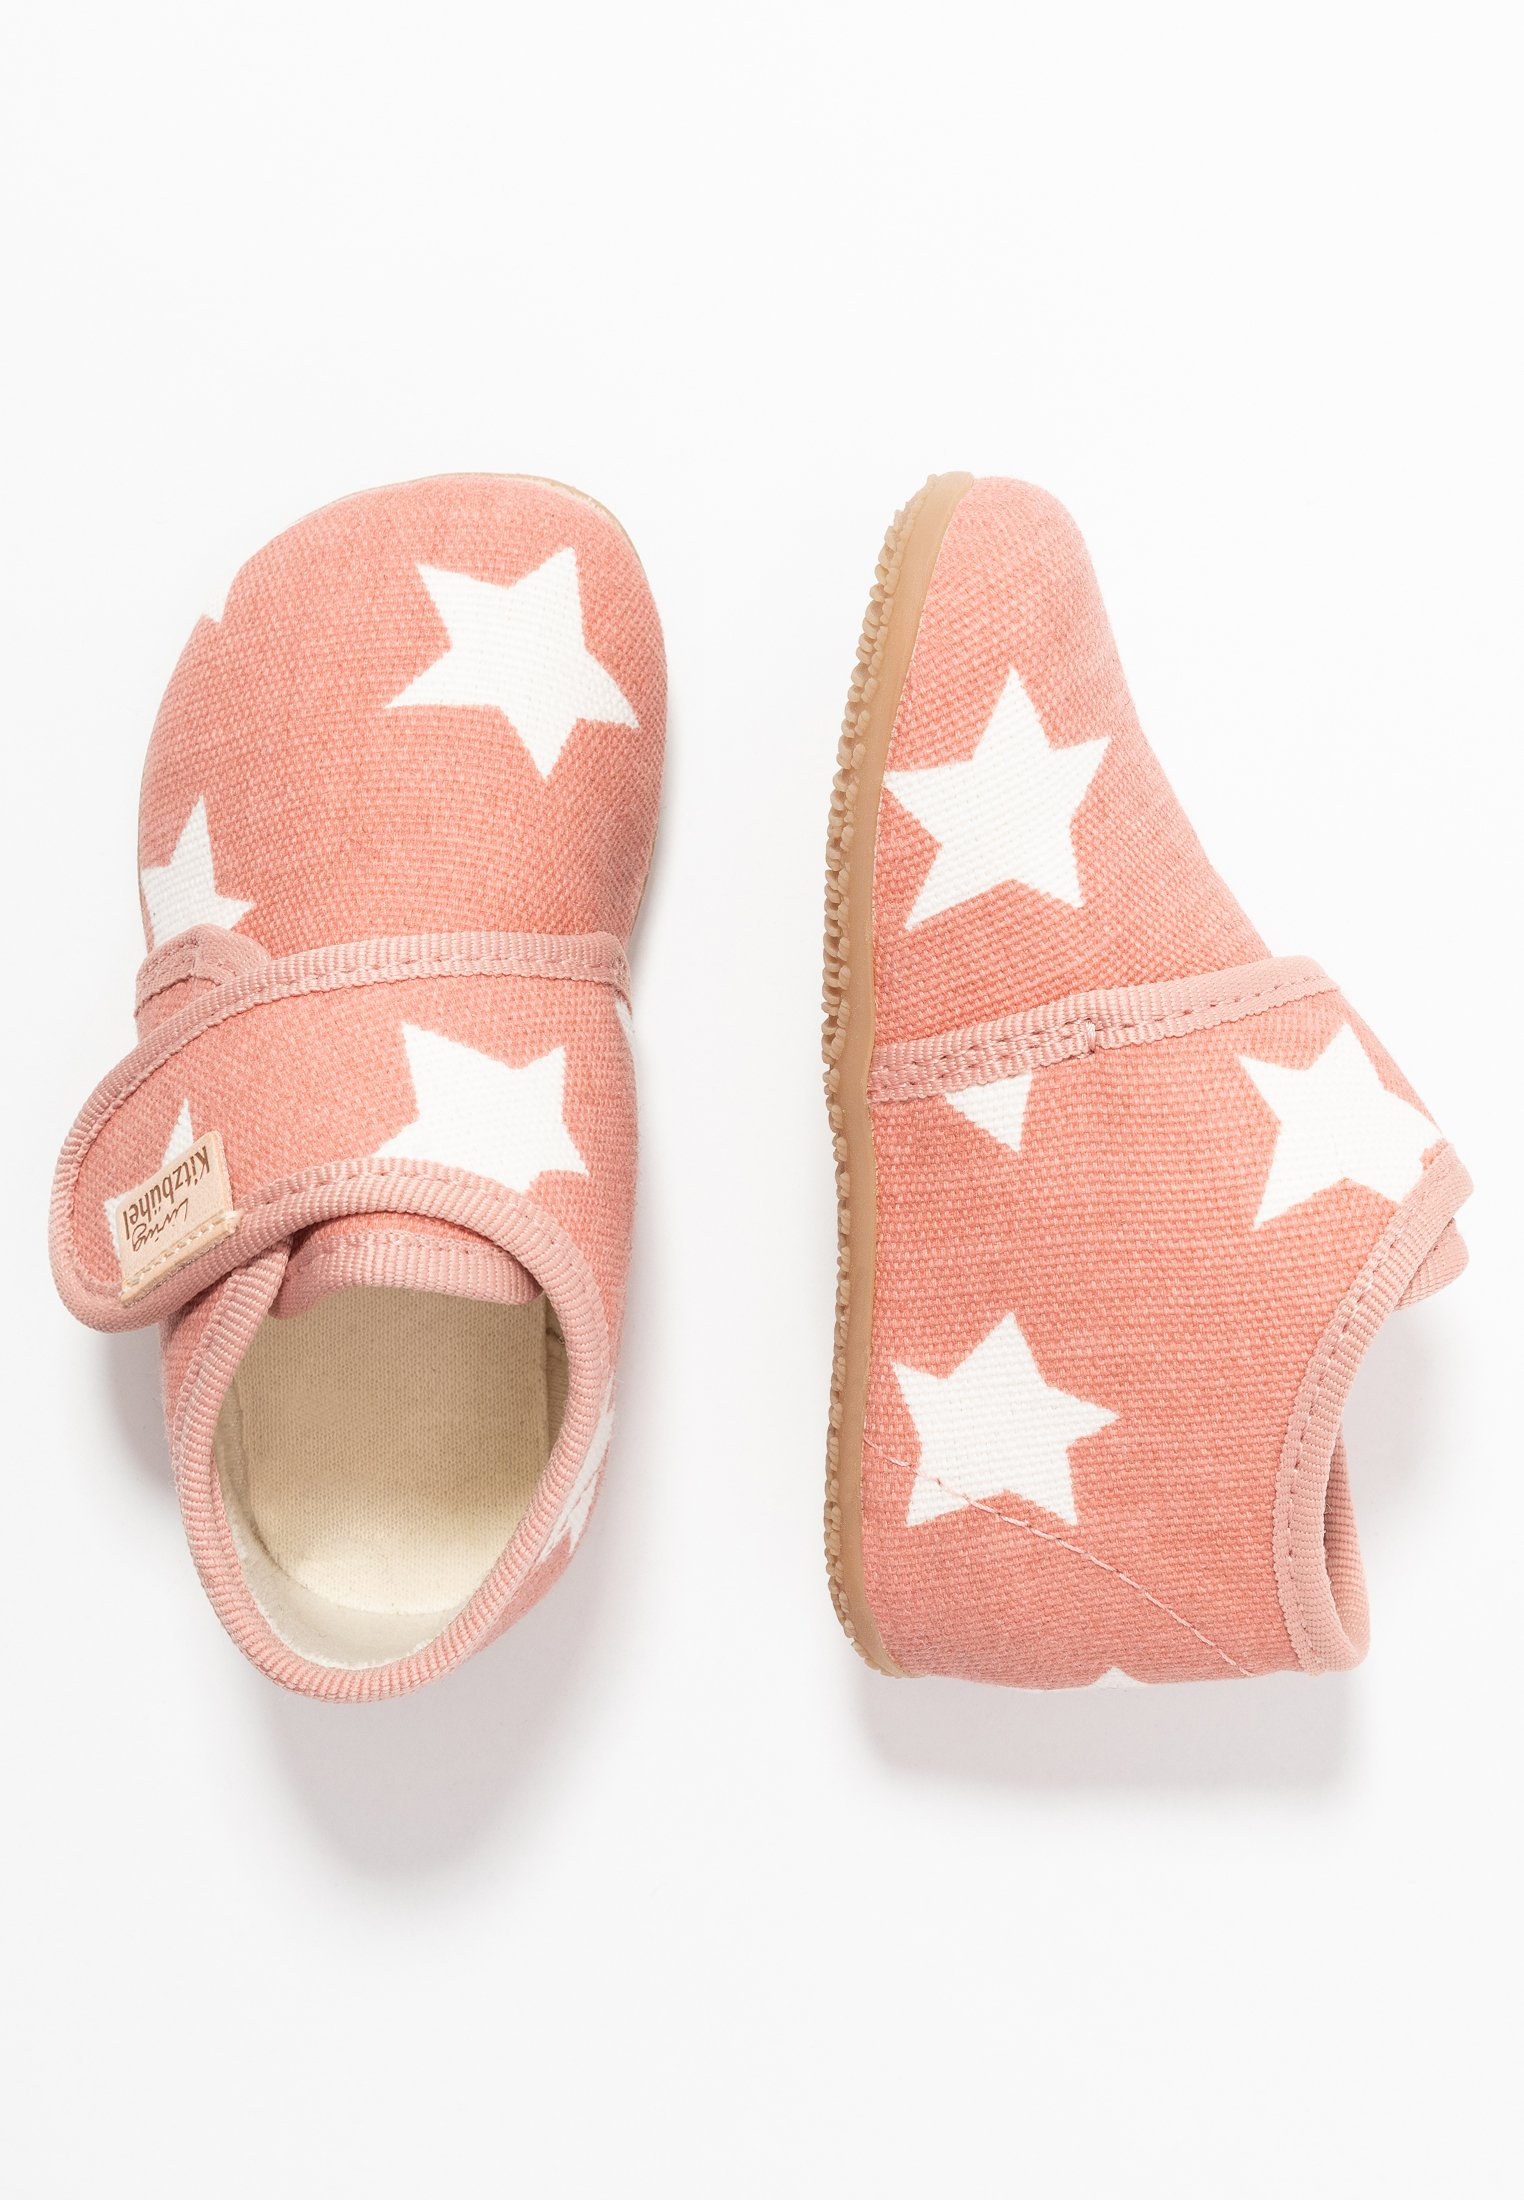 Kids BABYKLETT STERNE - Touch-strap shoes